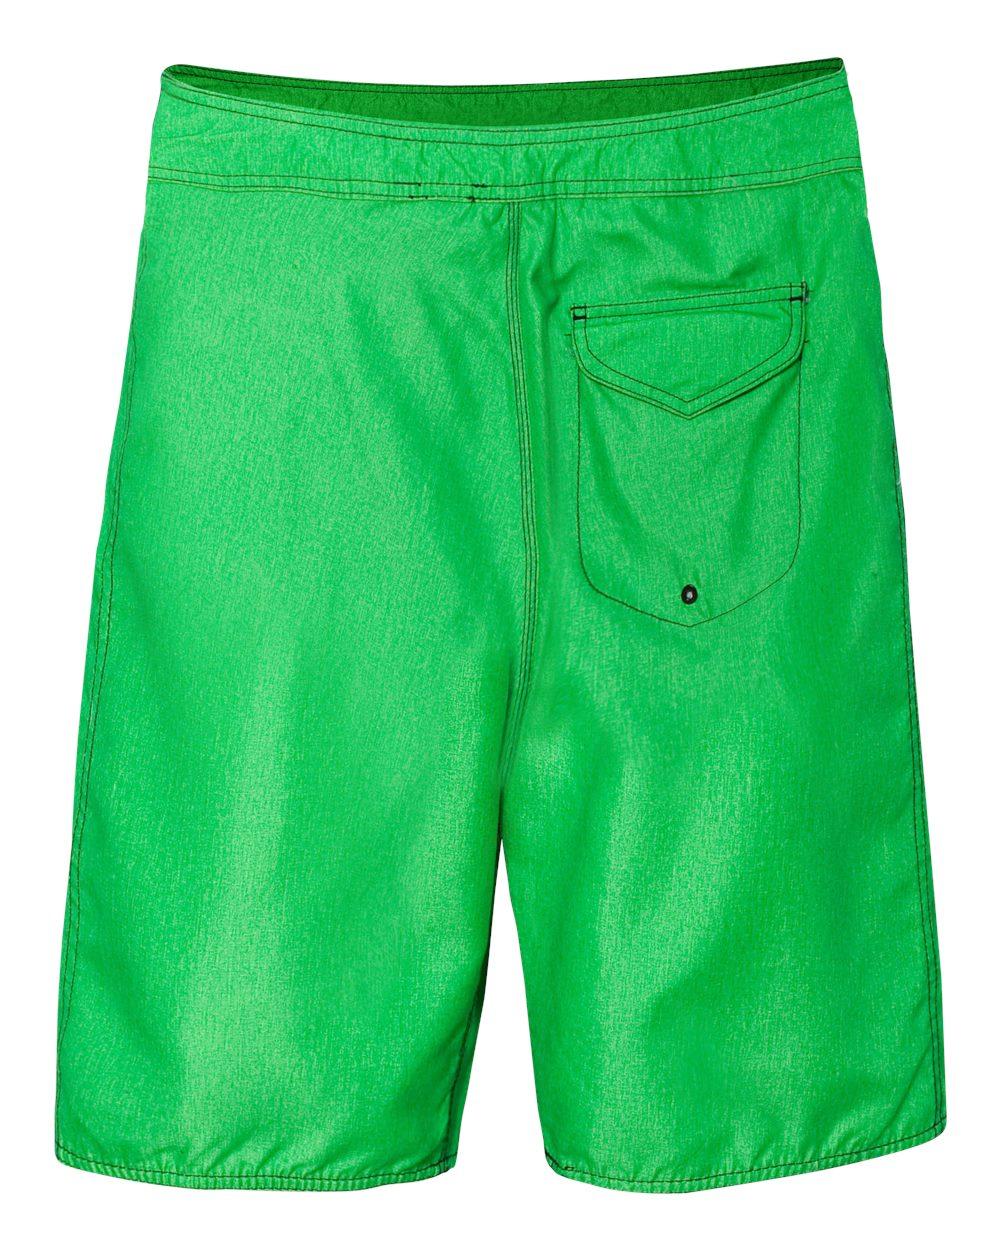 Burnside-Men-039-s-Heathered-Board-Shorts-B9305-30-40 thumbnail 10